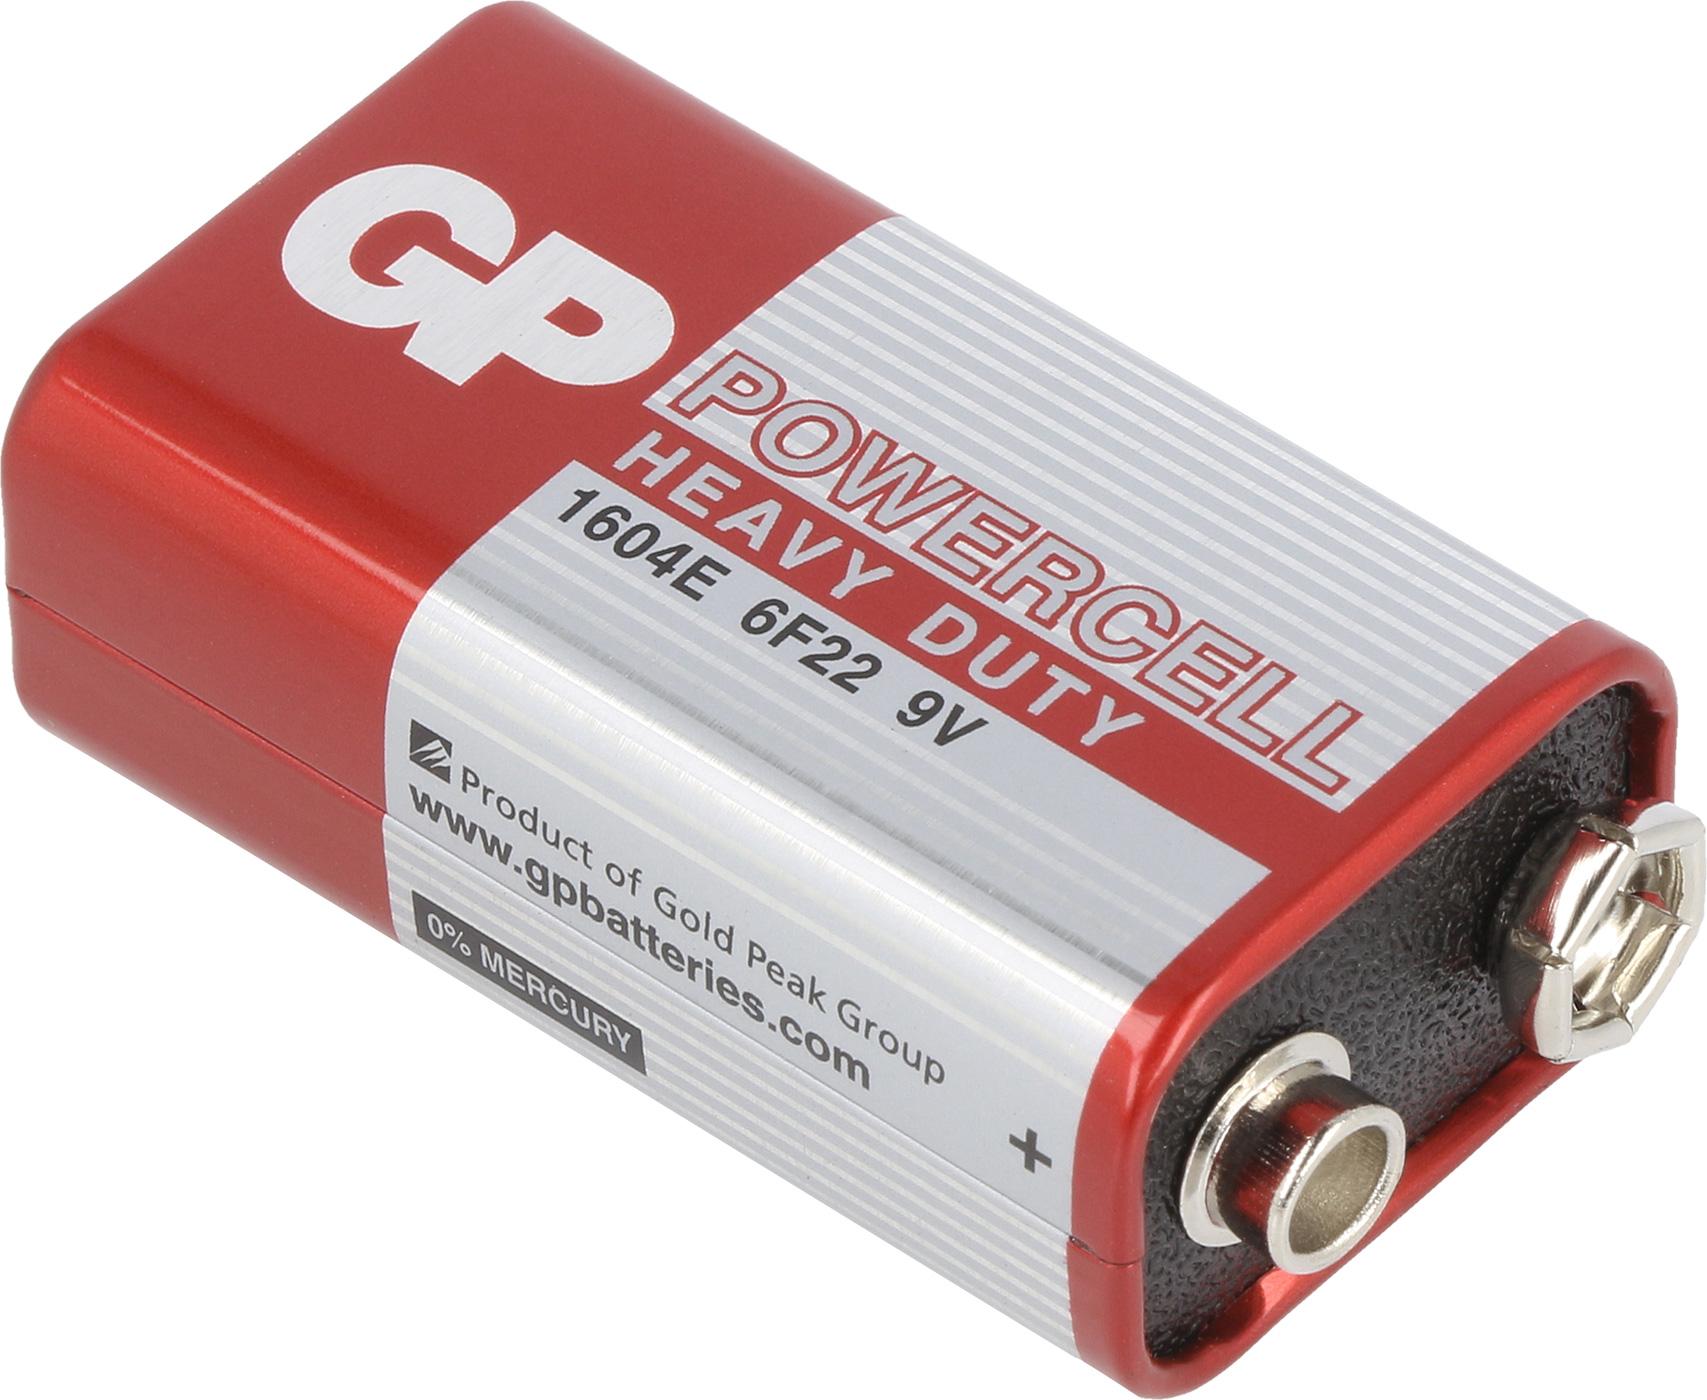 GP 1604G GP zinc cell